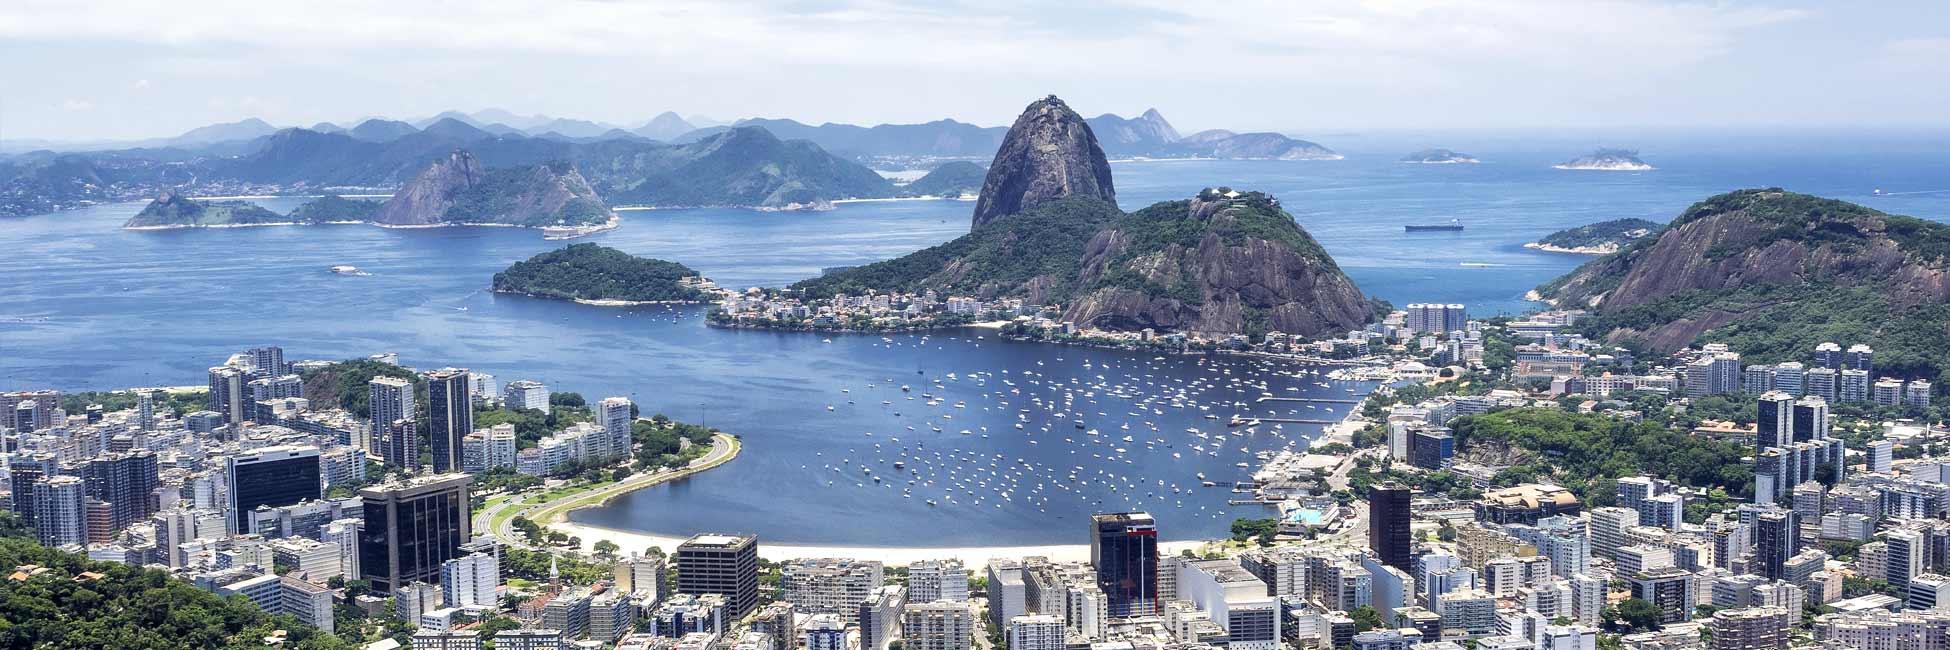 Rio de Janeiro, Brazil Image Source: https://images.app.goo.gl/hGrBygLG9xpMKq547